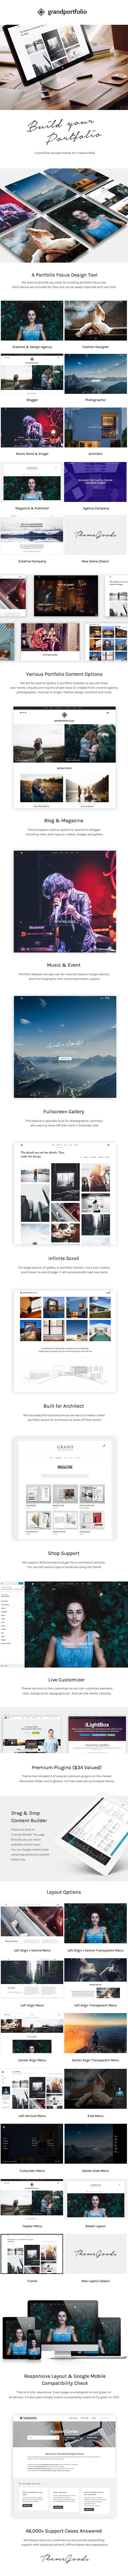 GrandPortfolioFeatures2 - Grand Portfolio WordPress